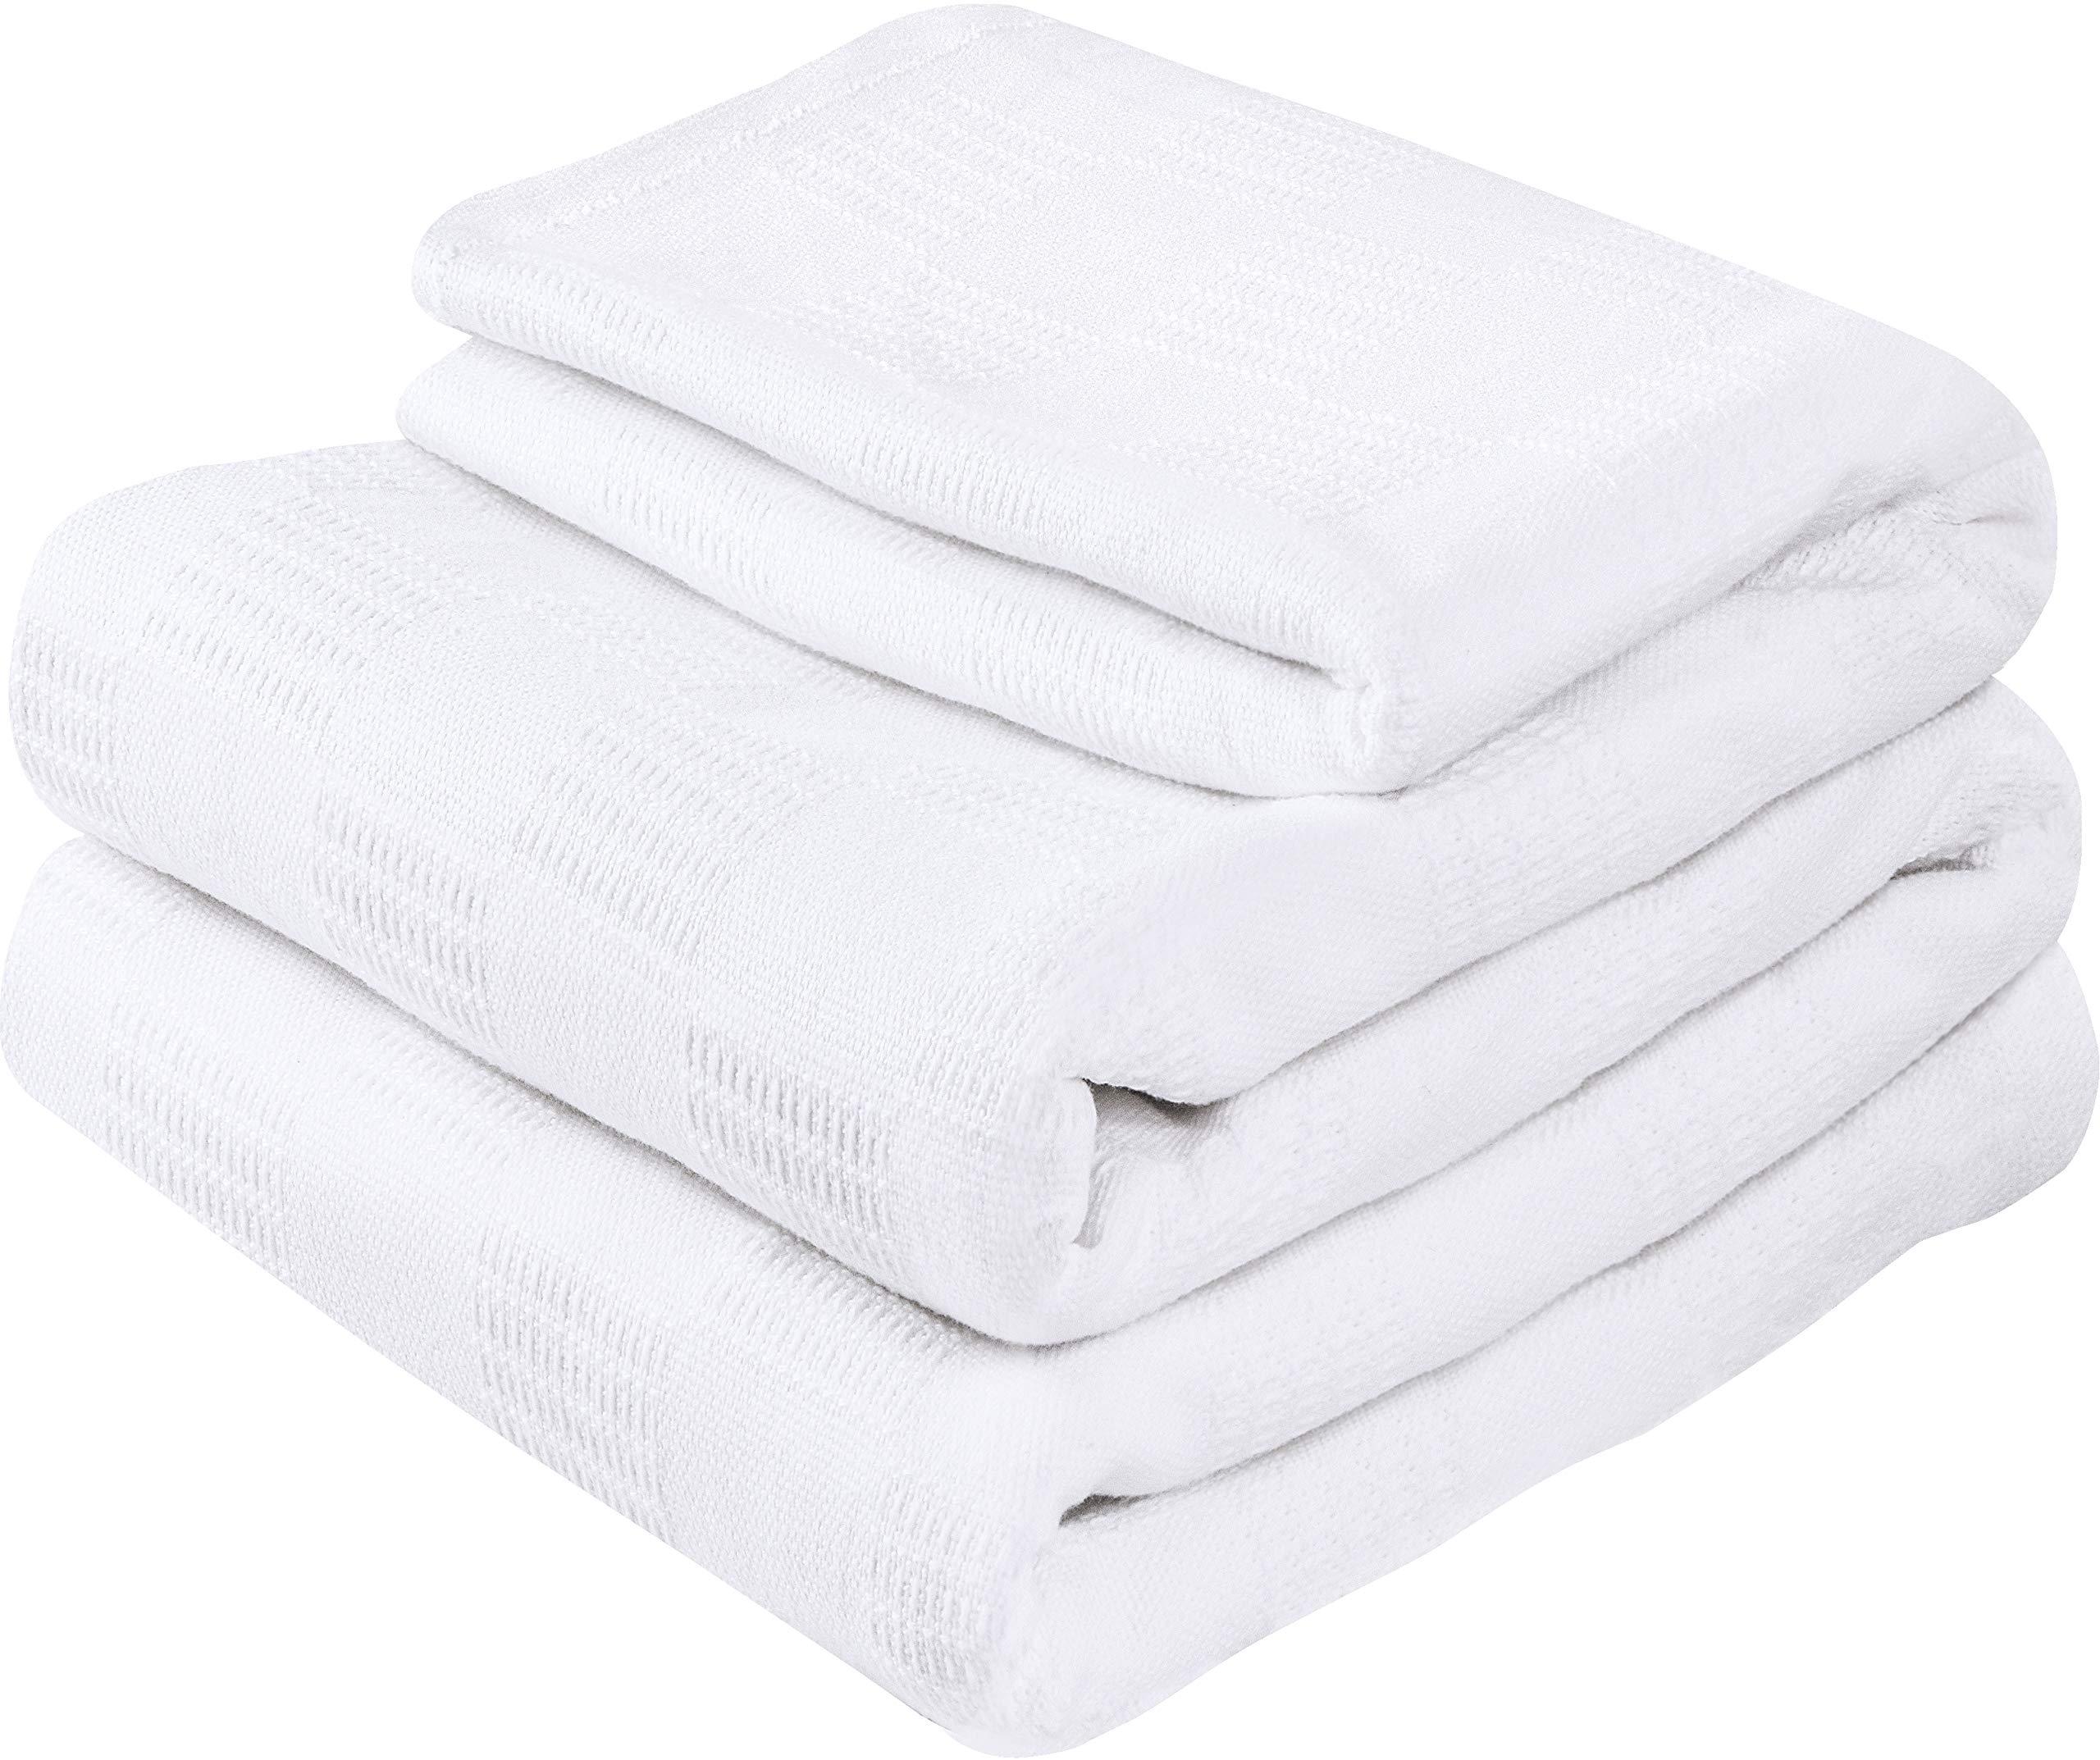 Utopia Bedding Summer Blanket Breathable